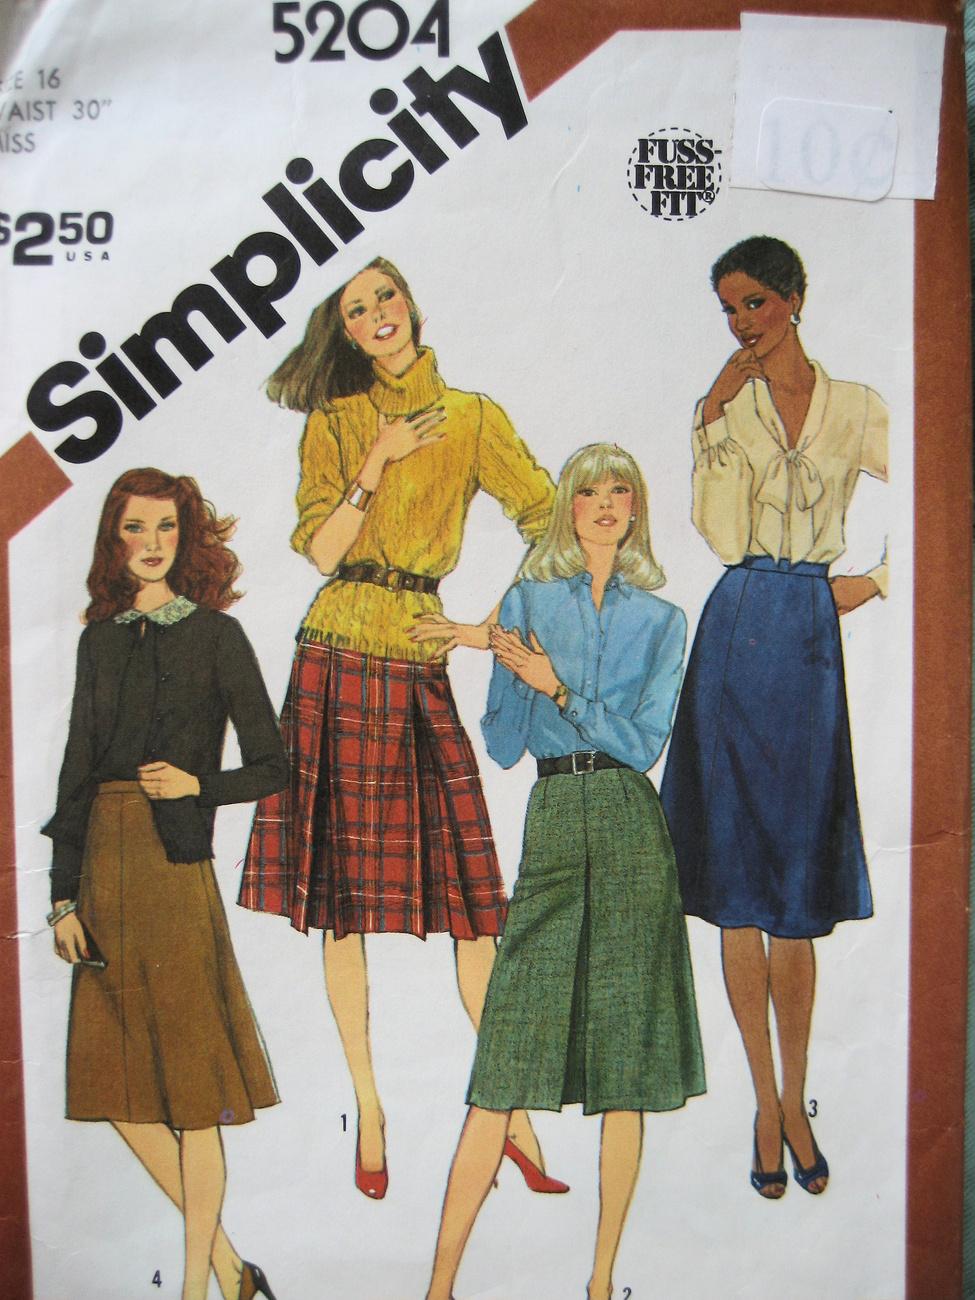 Simplicity 5204  Misses Size 16 (W 30